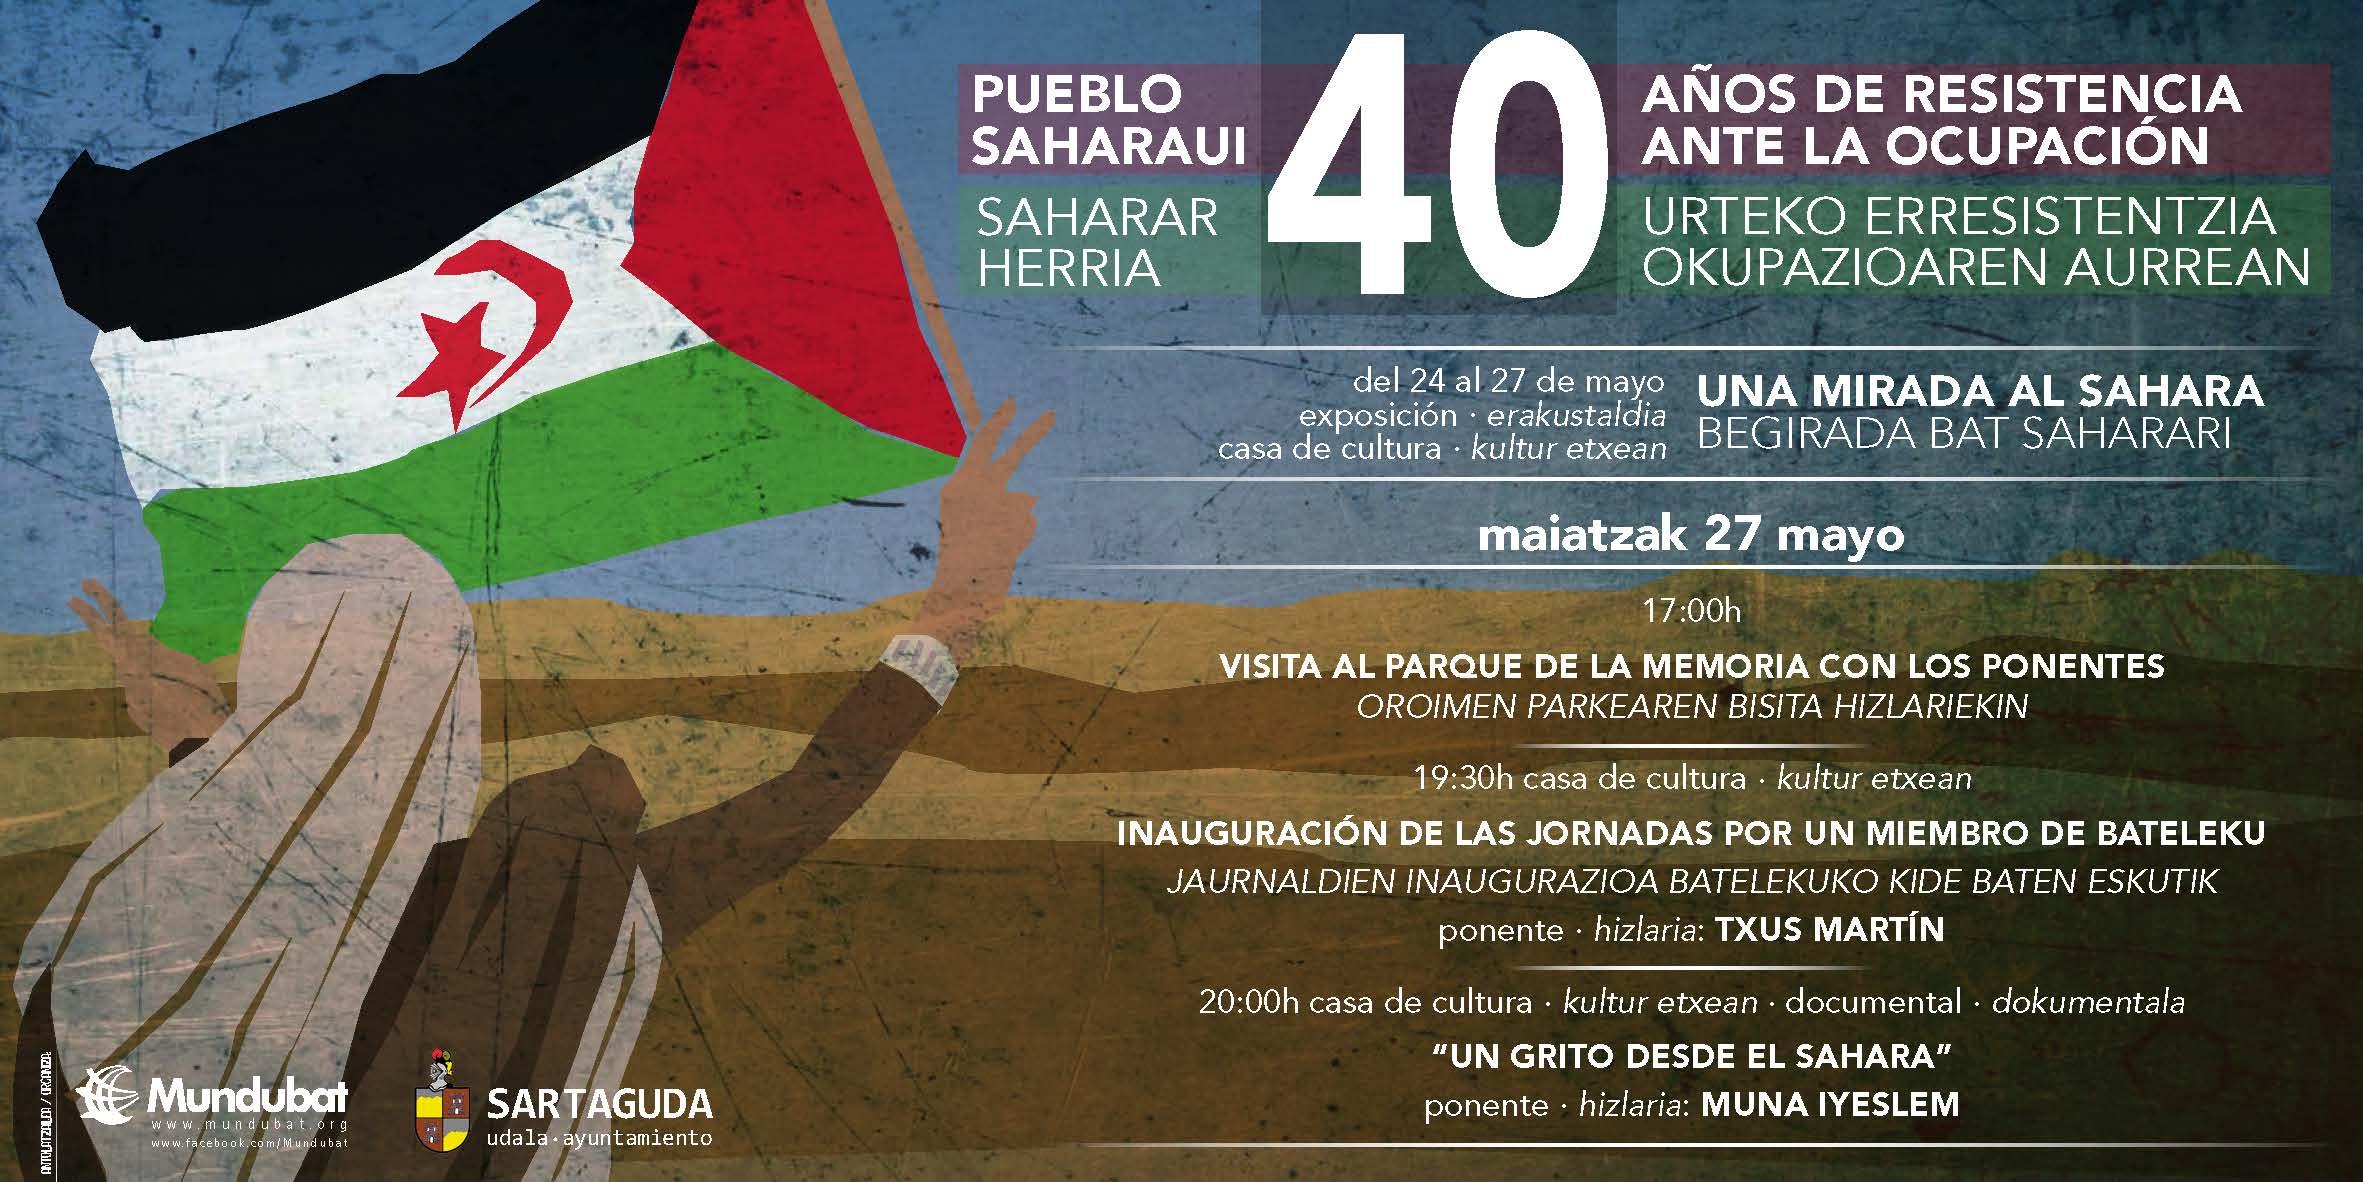 Sahara resiste la ocupación